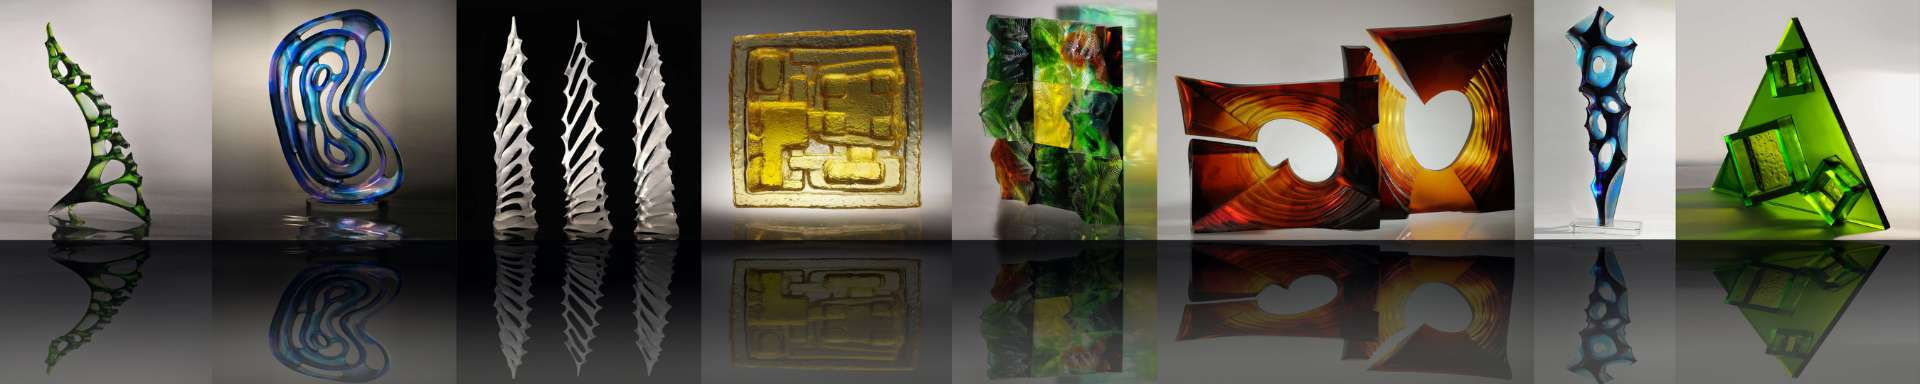 lu-chi_glass-sculptures_gallery_slide114_1920x384